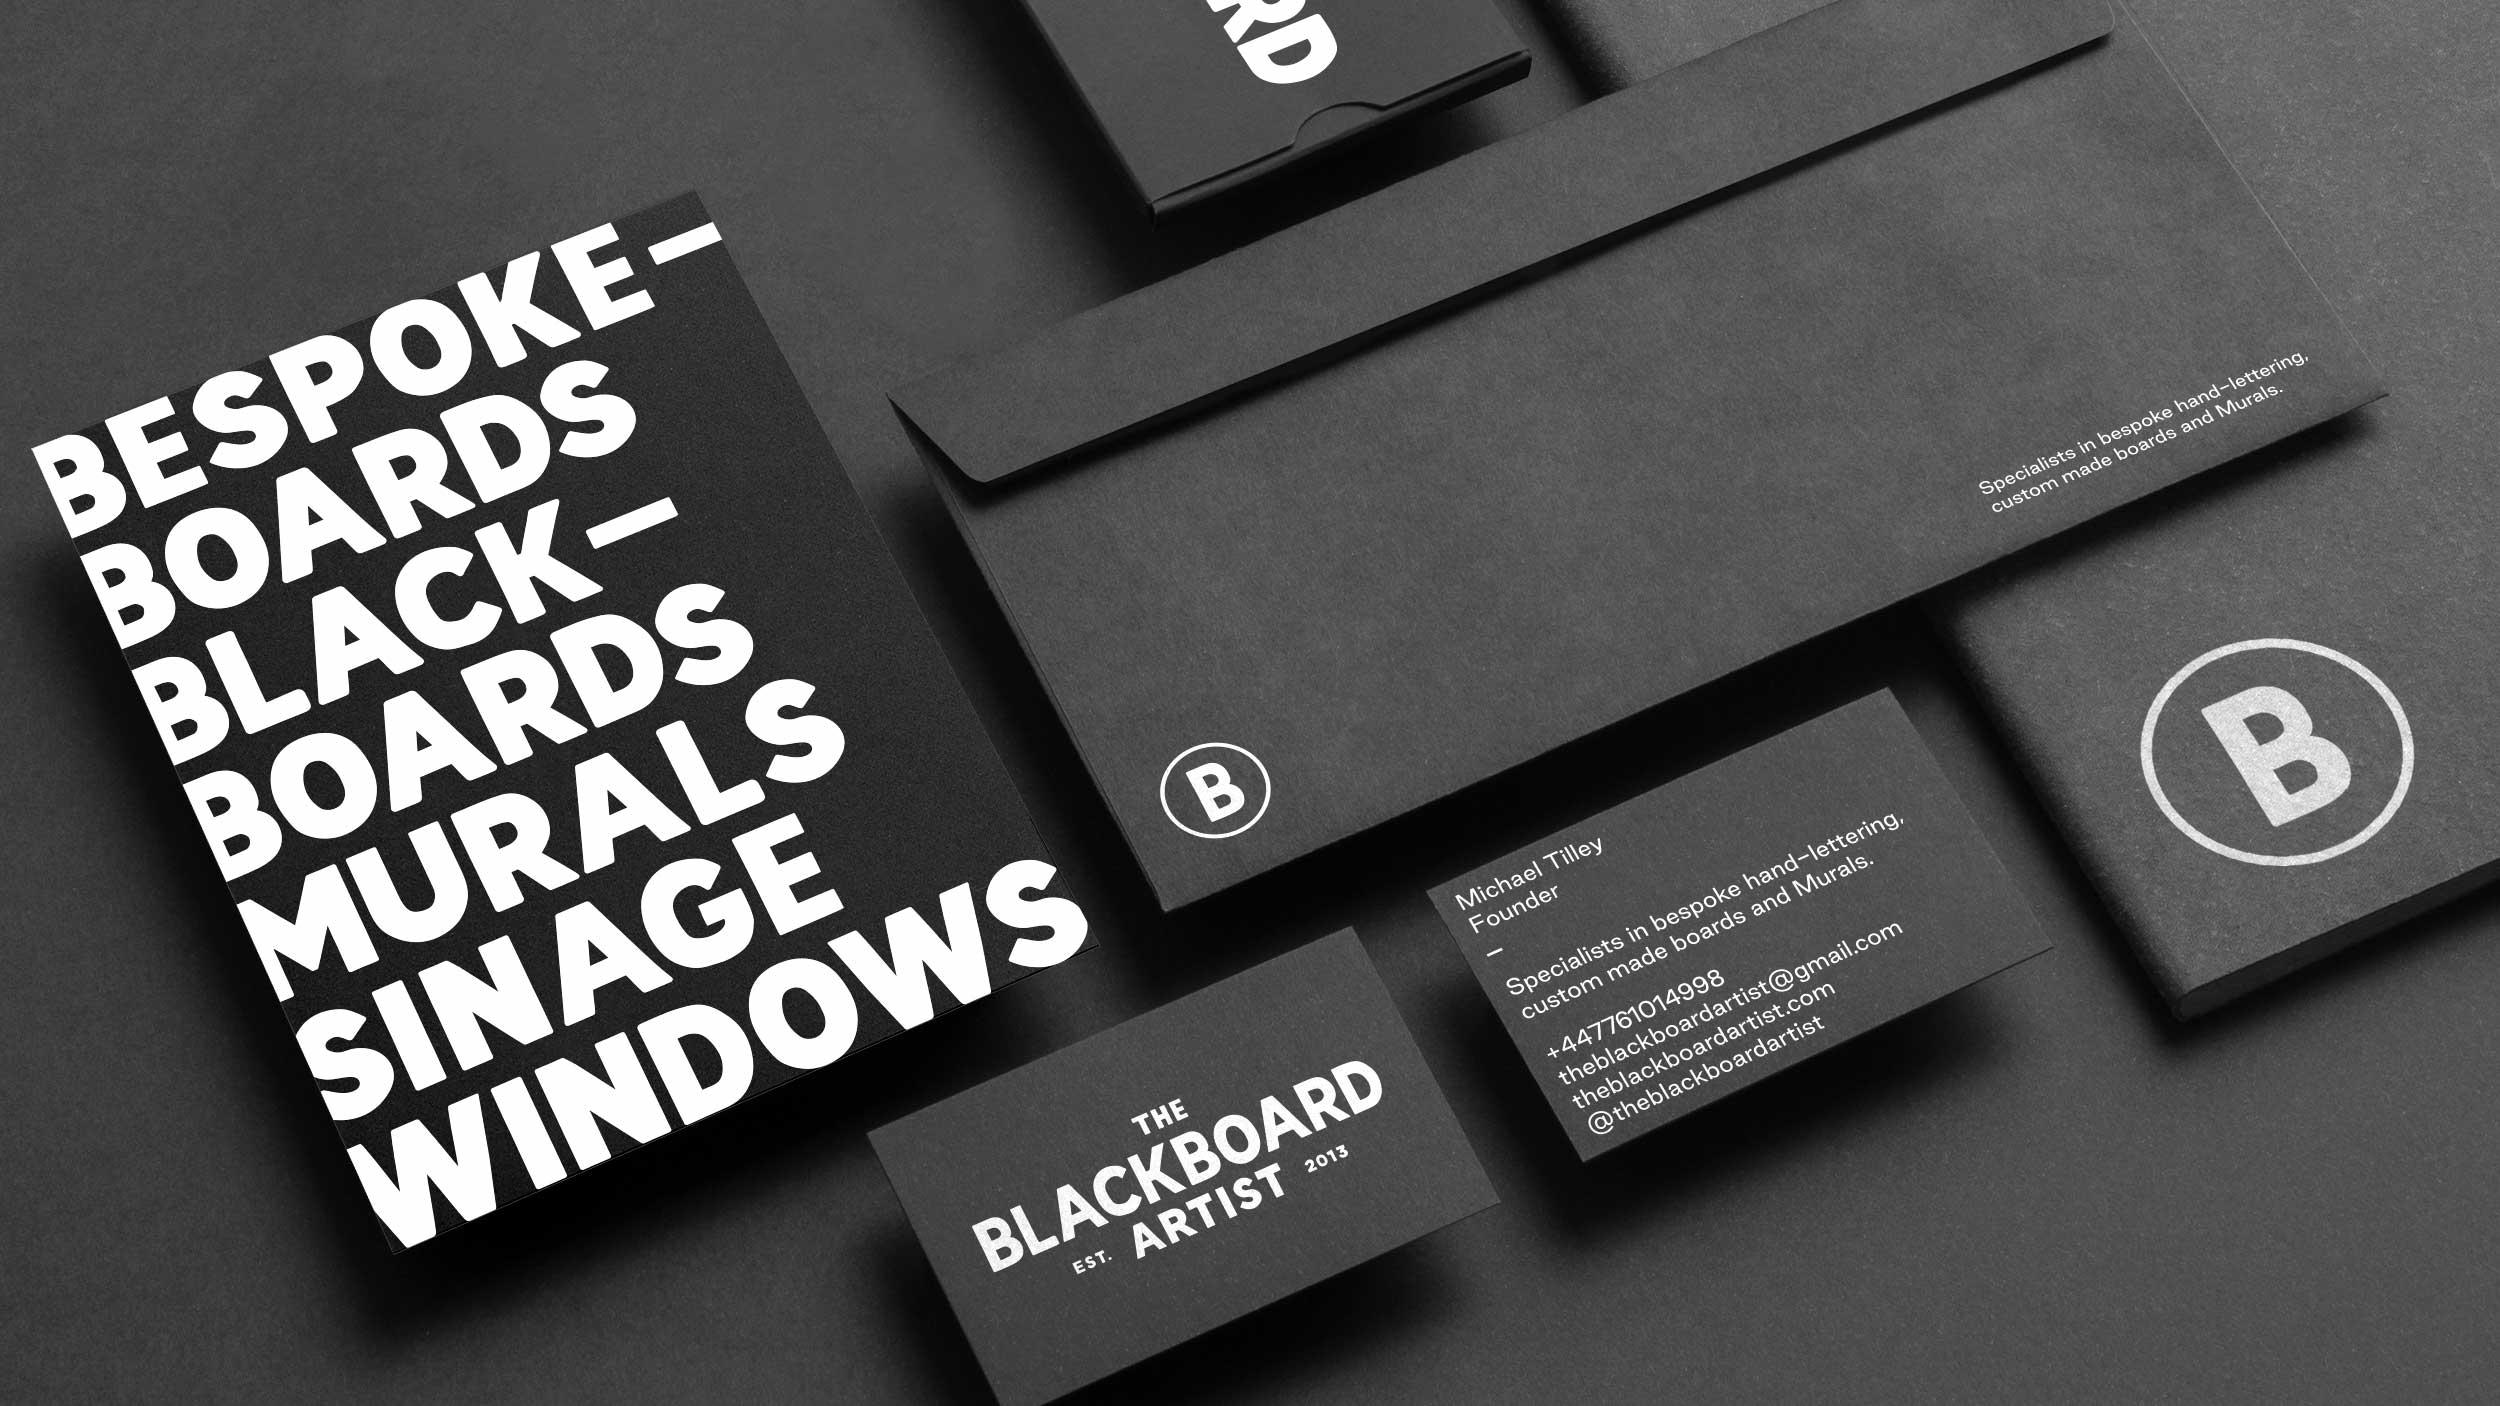 The Blackboard Artist stationery design